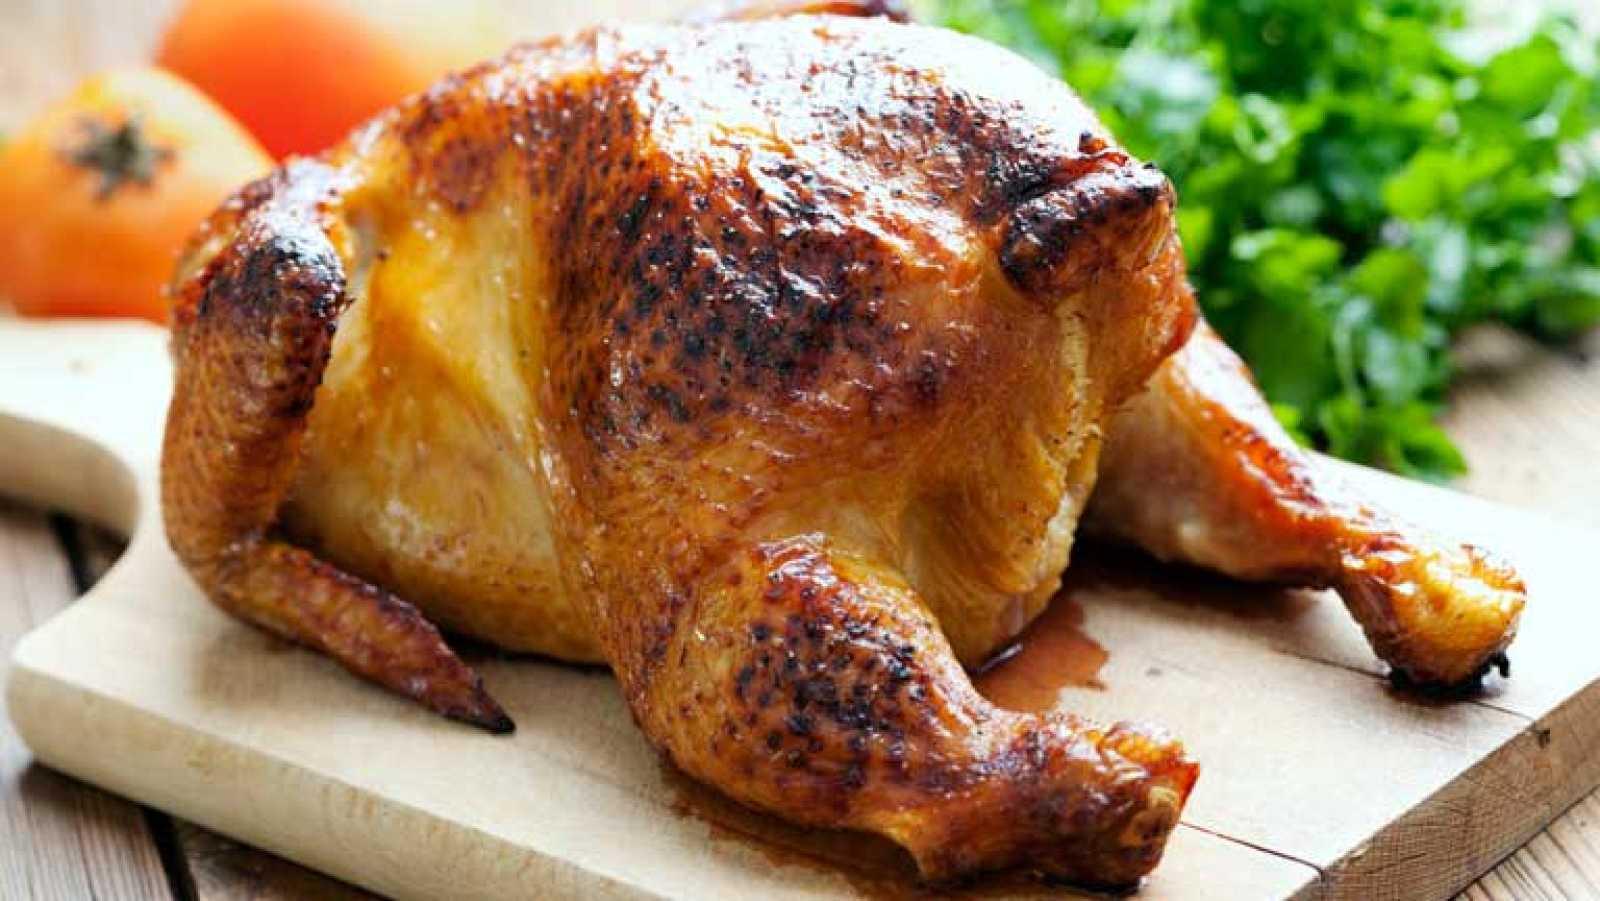 Cocina con Sergio - No me sale - Pollo asado